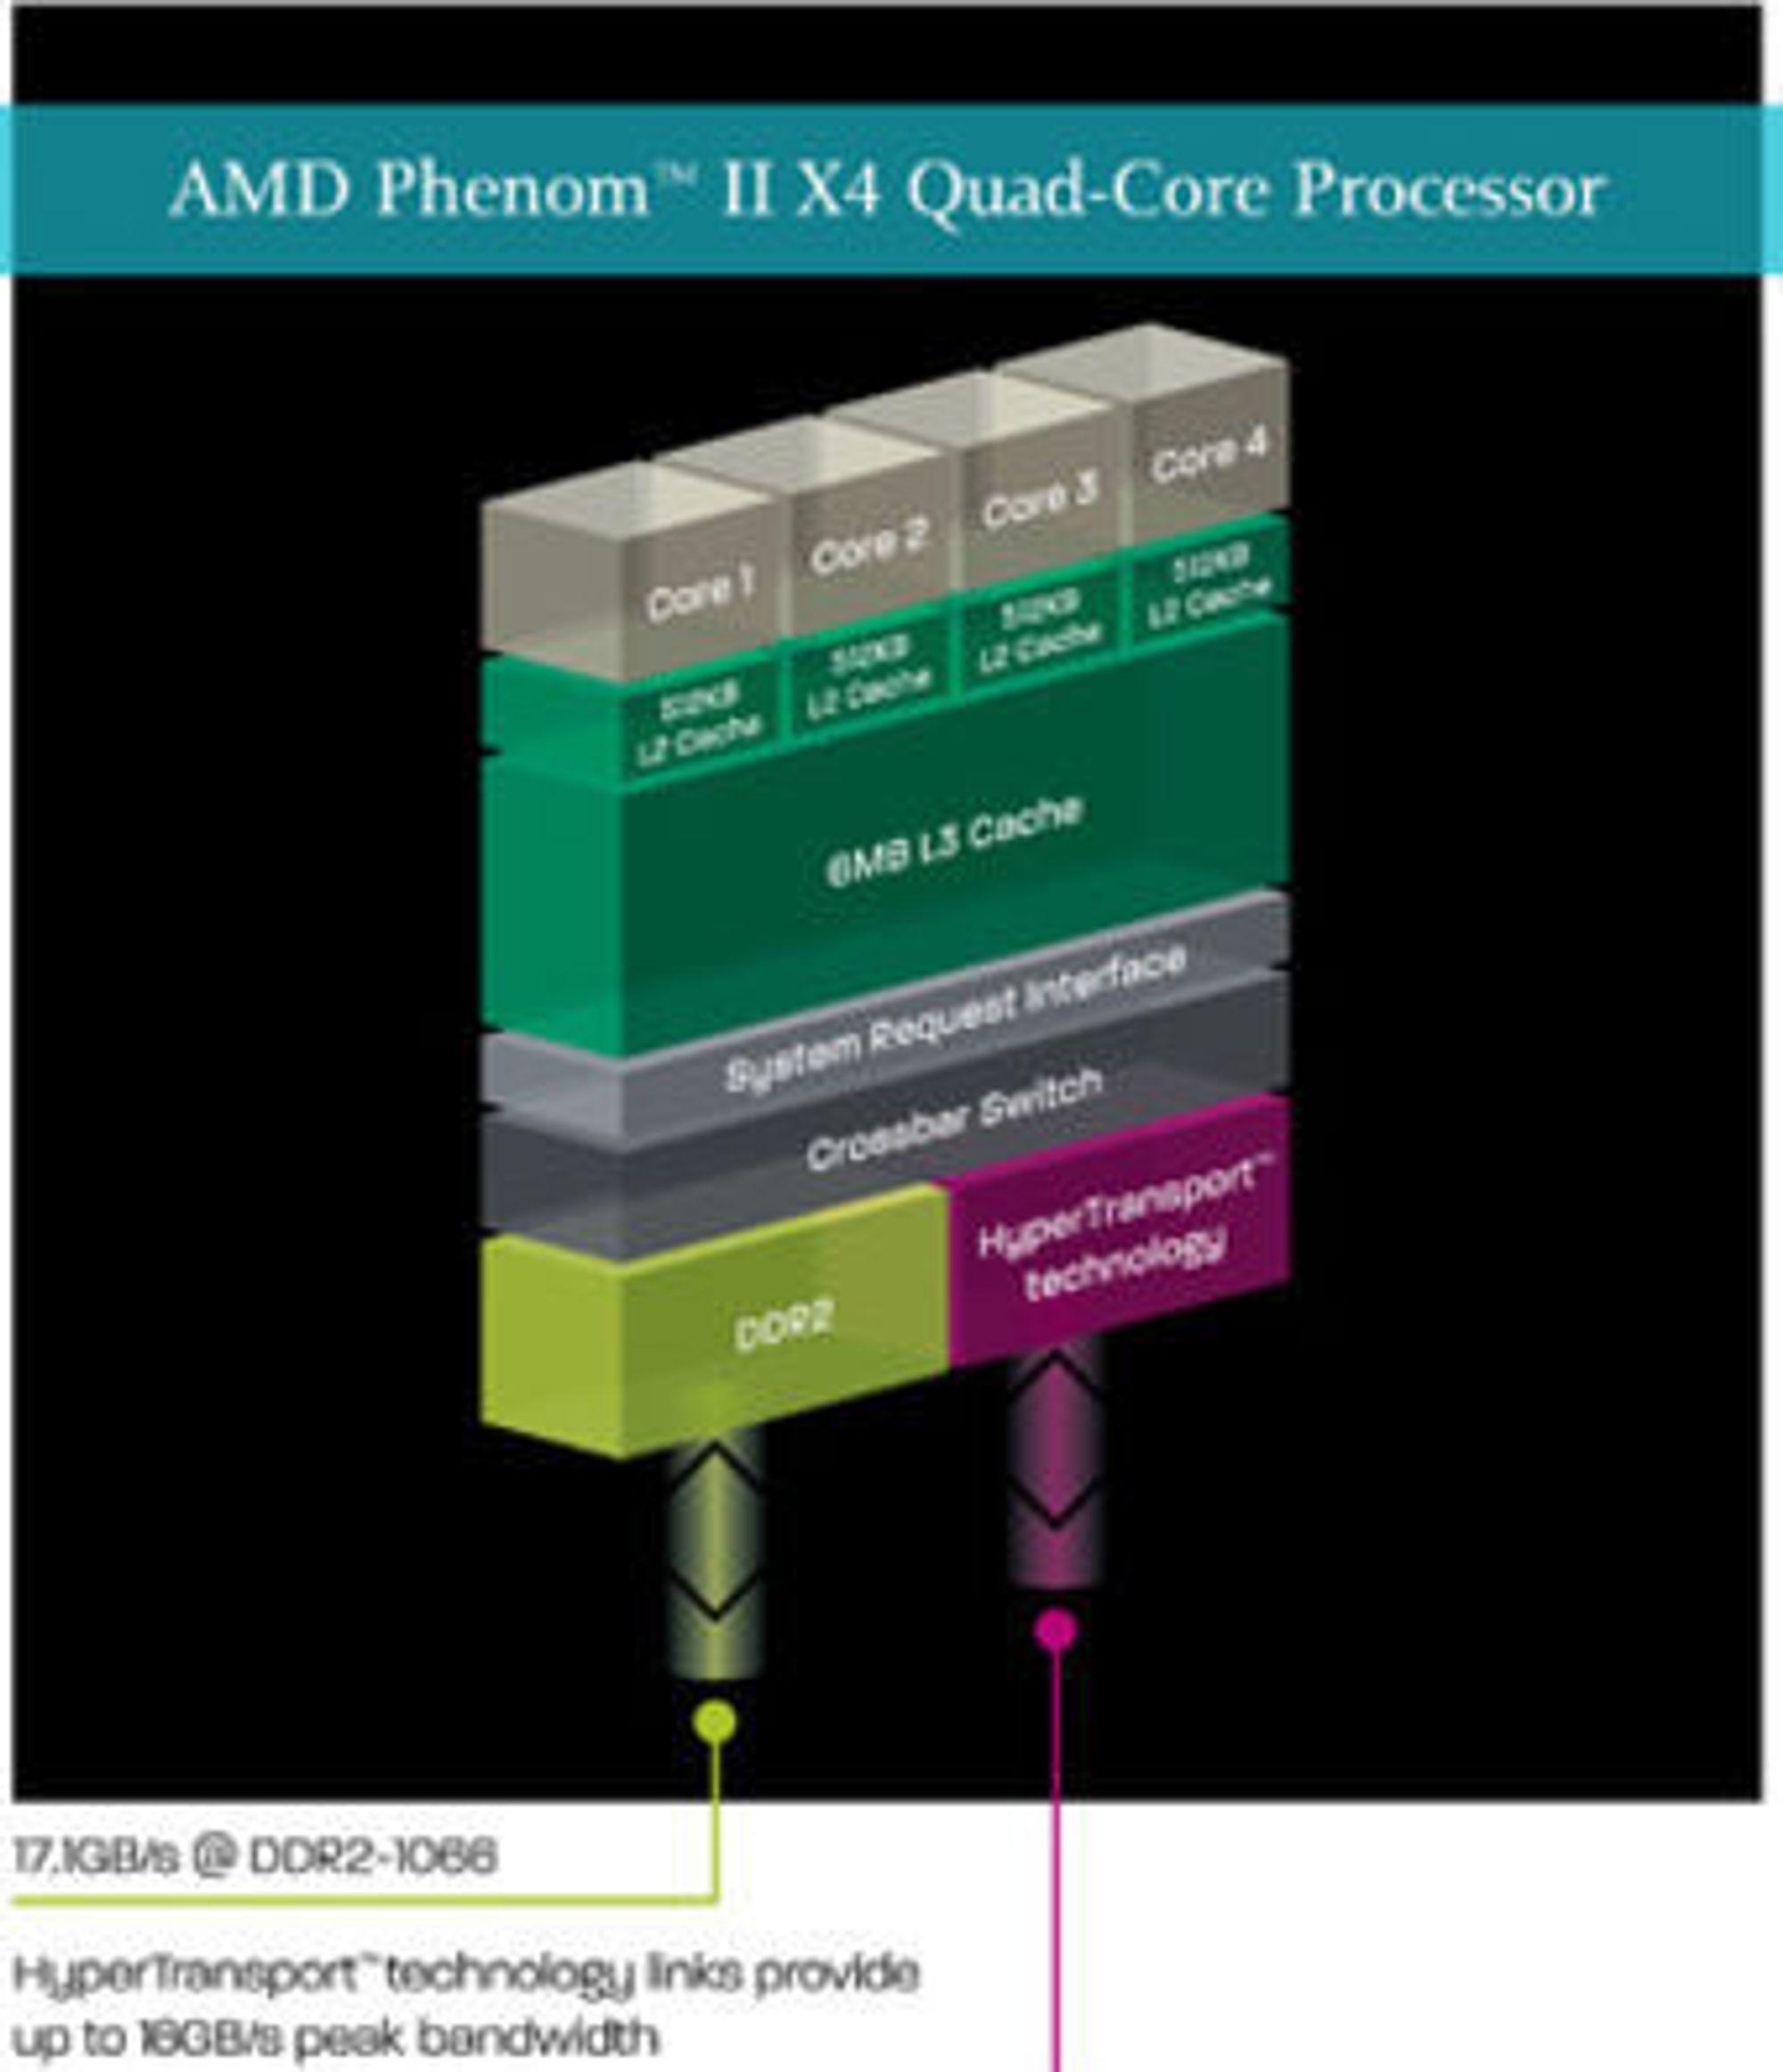 Hovedtrekkene i AMD Phenom II-arkitekturen